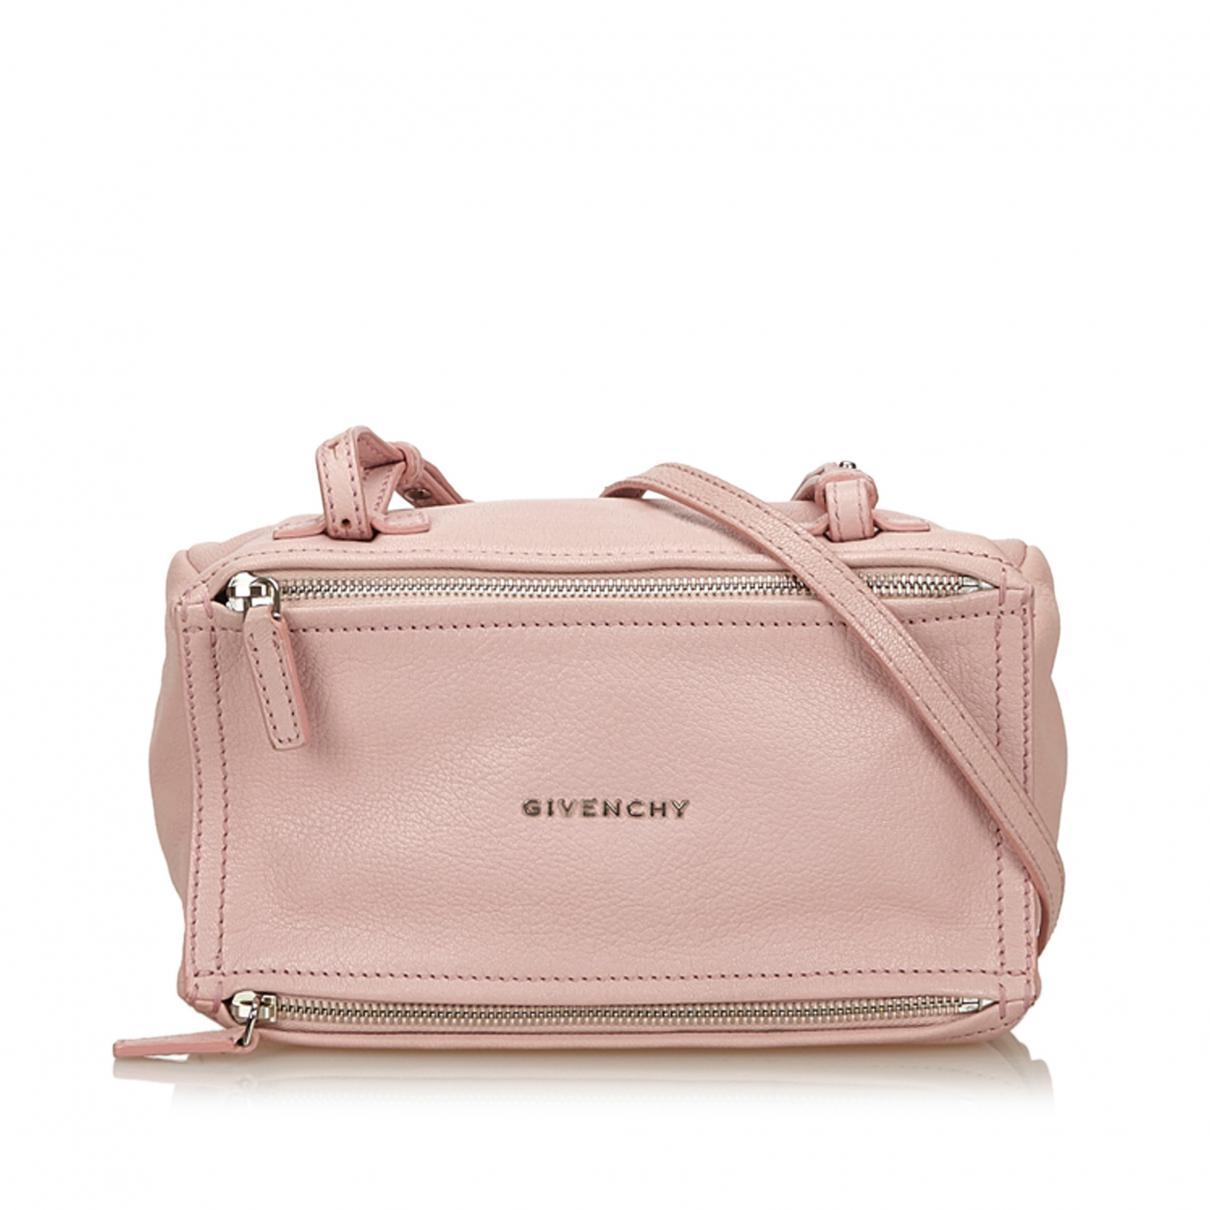 Givenchy Pre-owned - Pandora leather handbag FybqO3aGTC